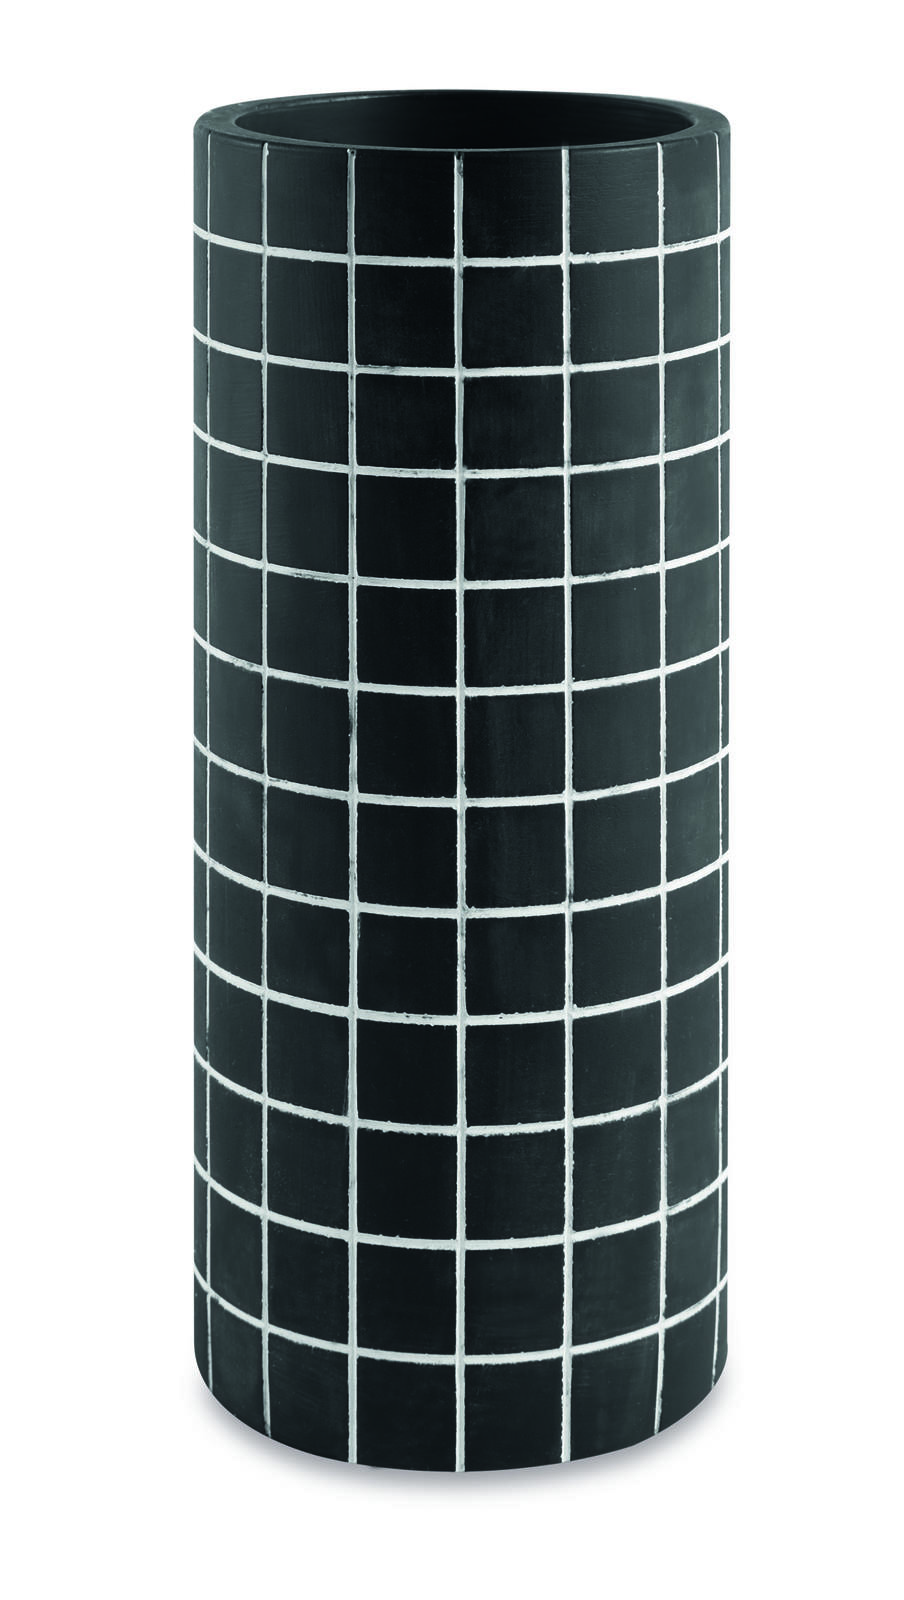 Kit Vaso Grid  - CASACOBRE